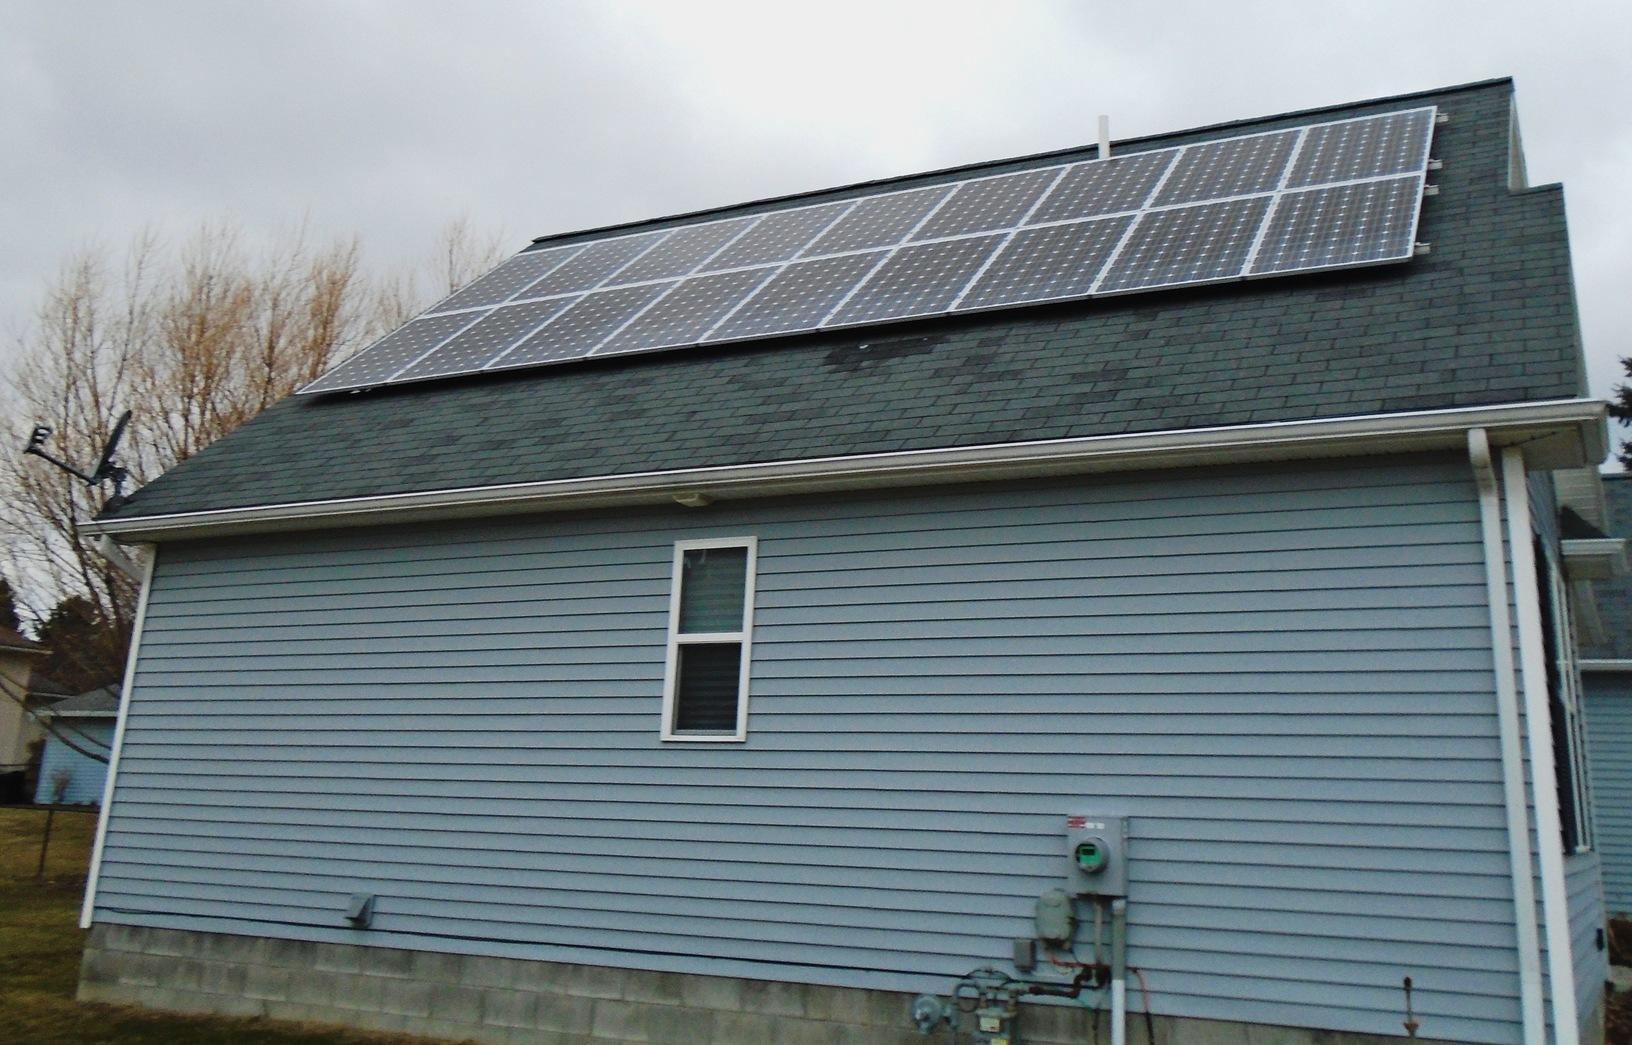 Solar Installation in Canandaigua, NY - After Photo